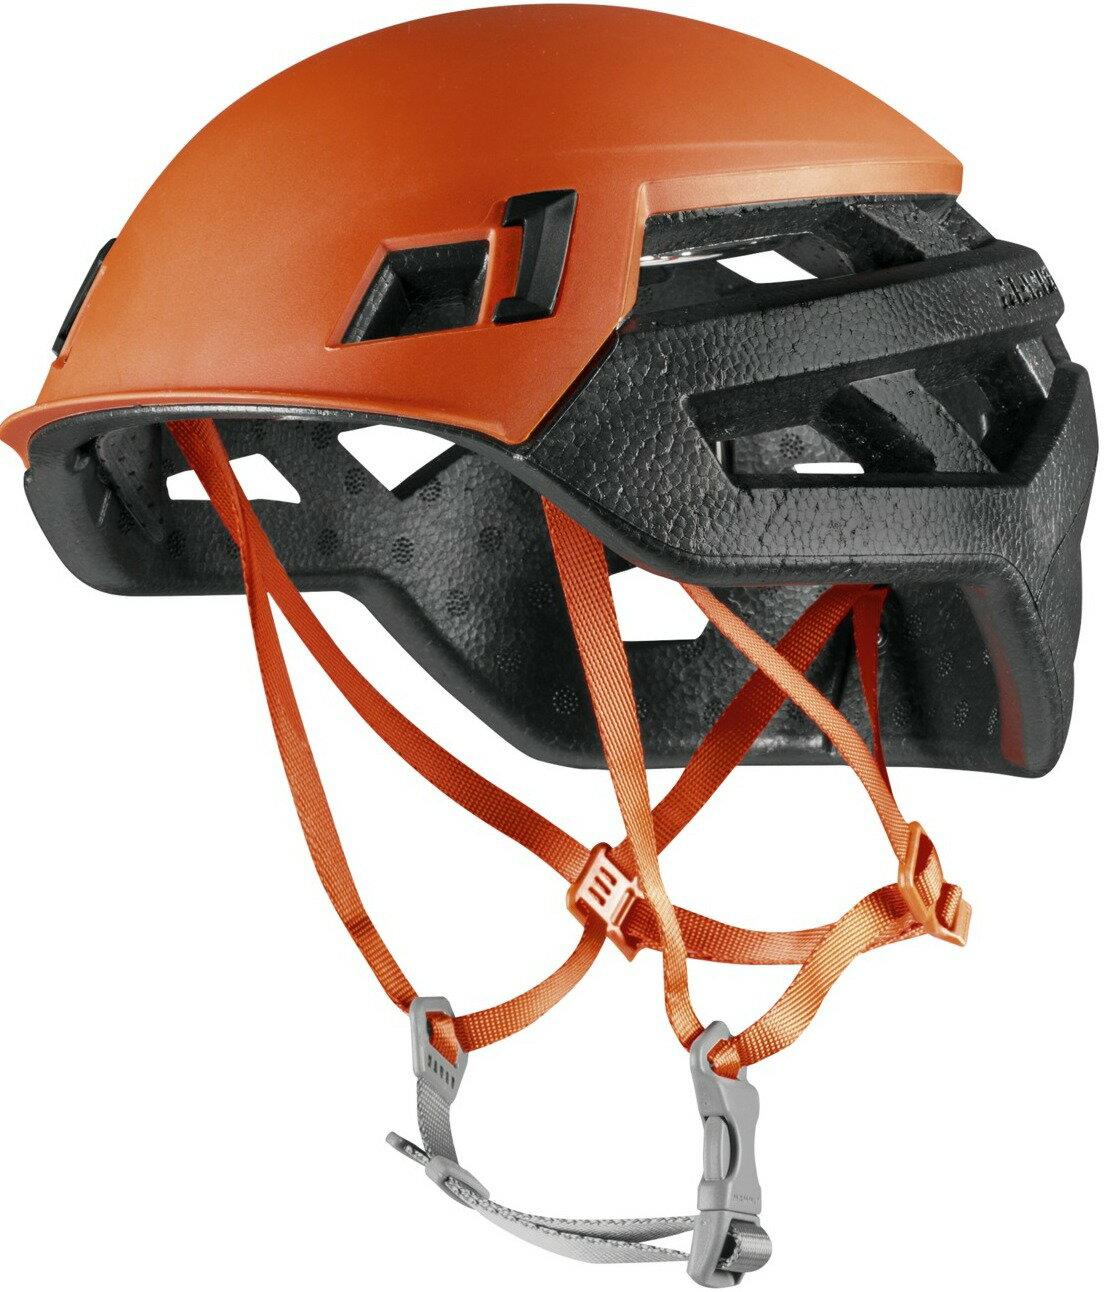 Mammut 長毛象 瑞士長毛象頭盔/岩盔 Wall Rider 2220-00140 2016 深橙 台北山水